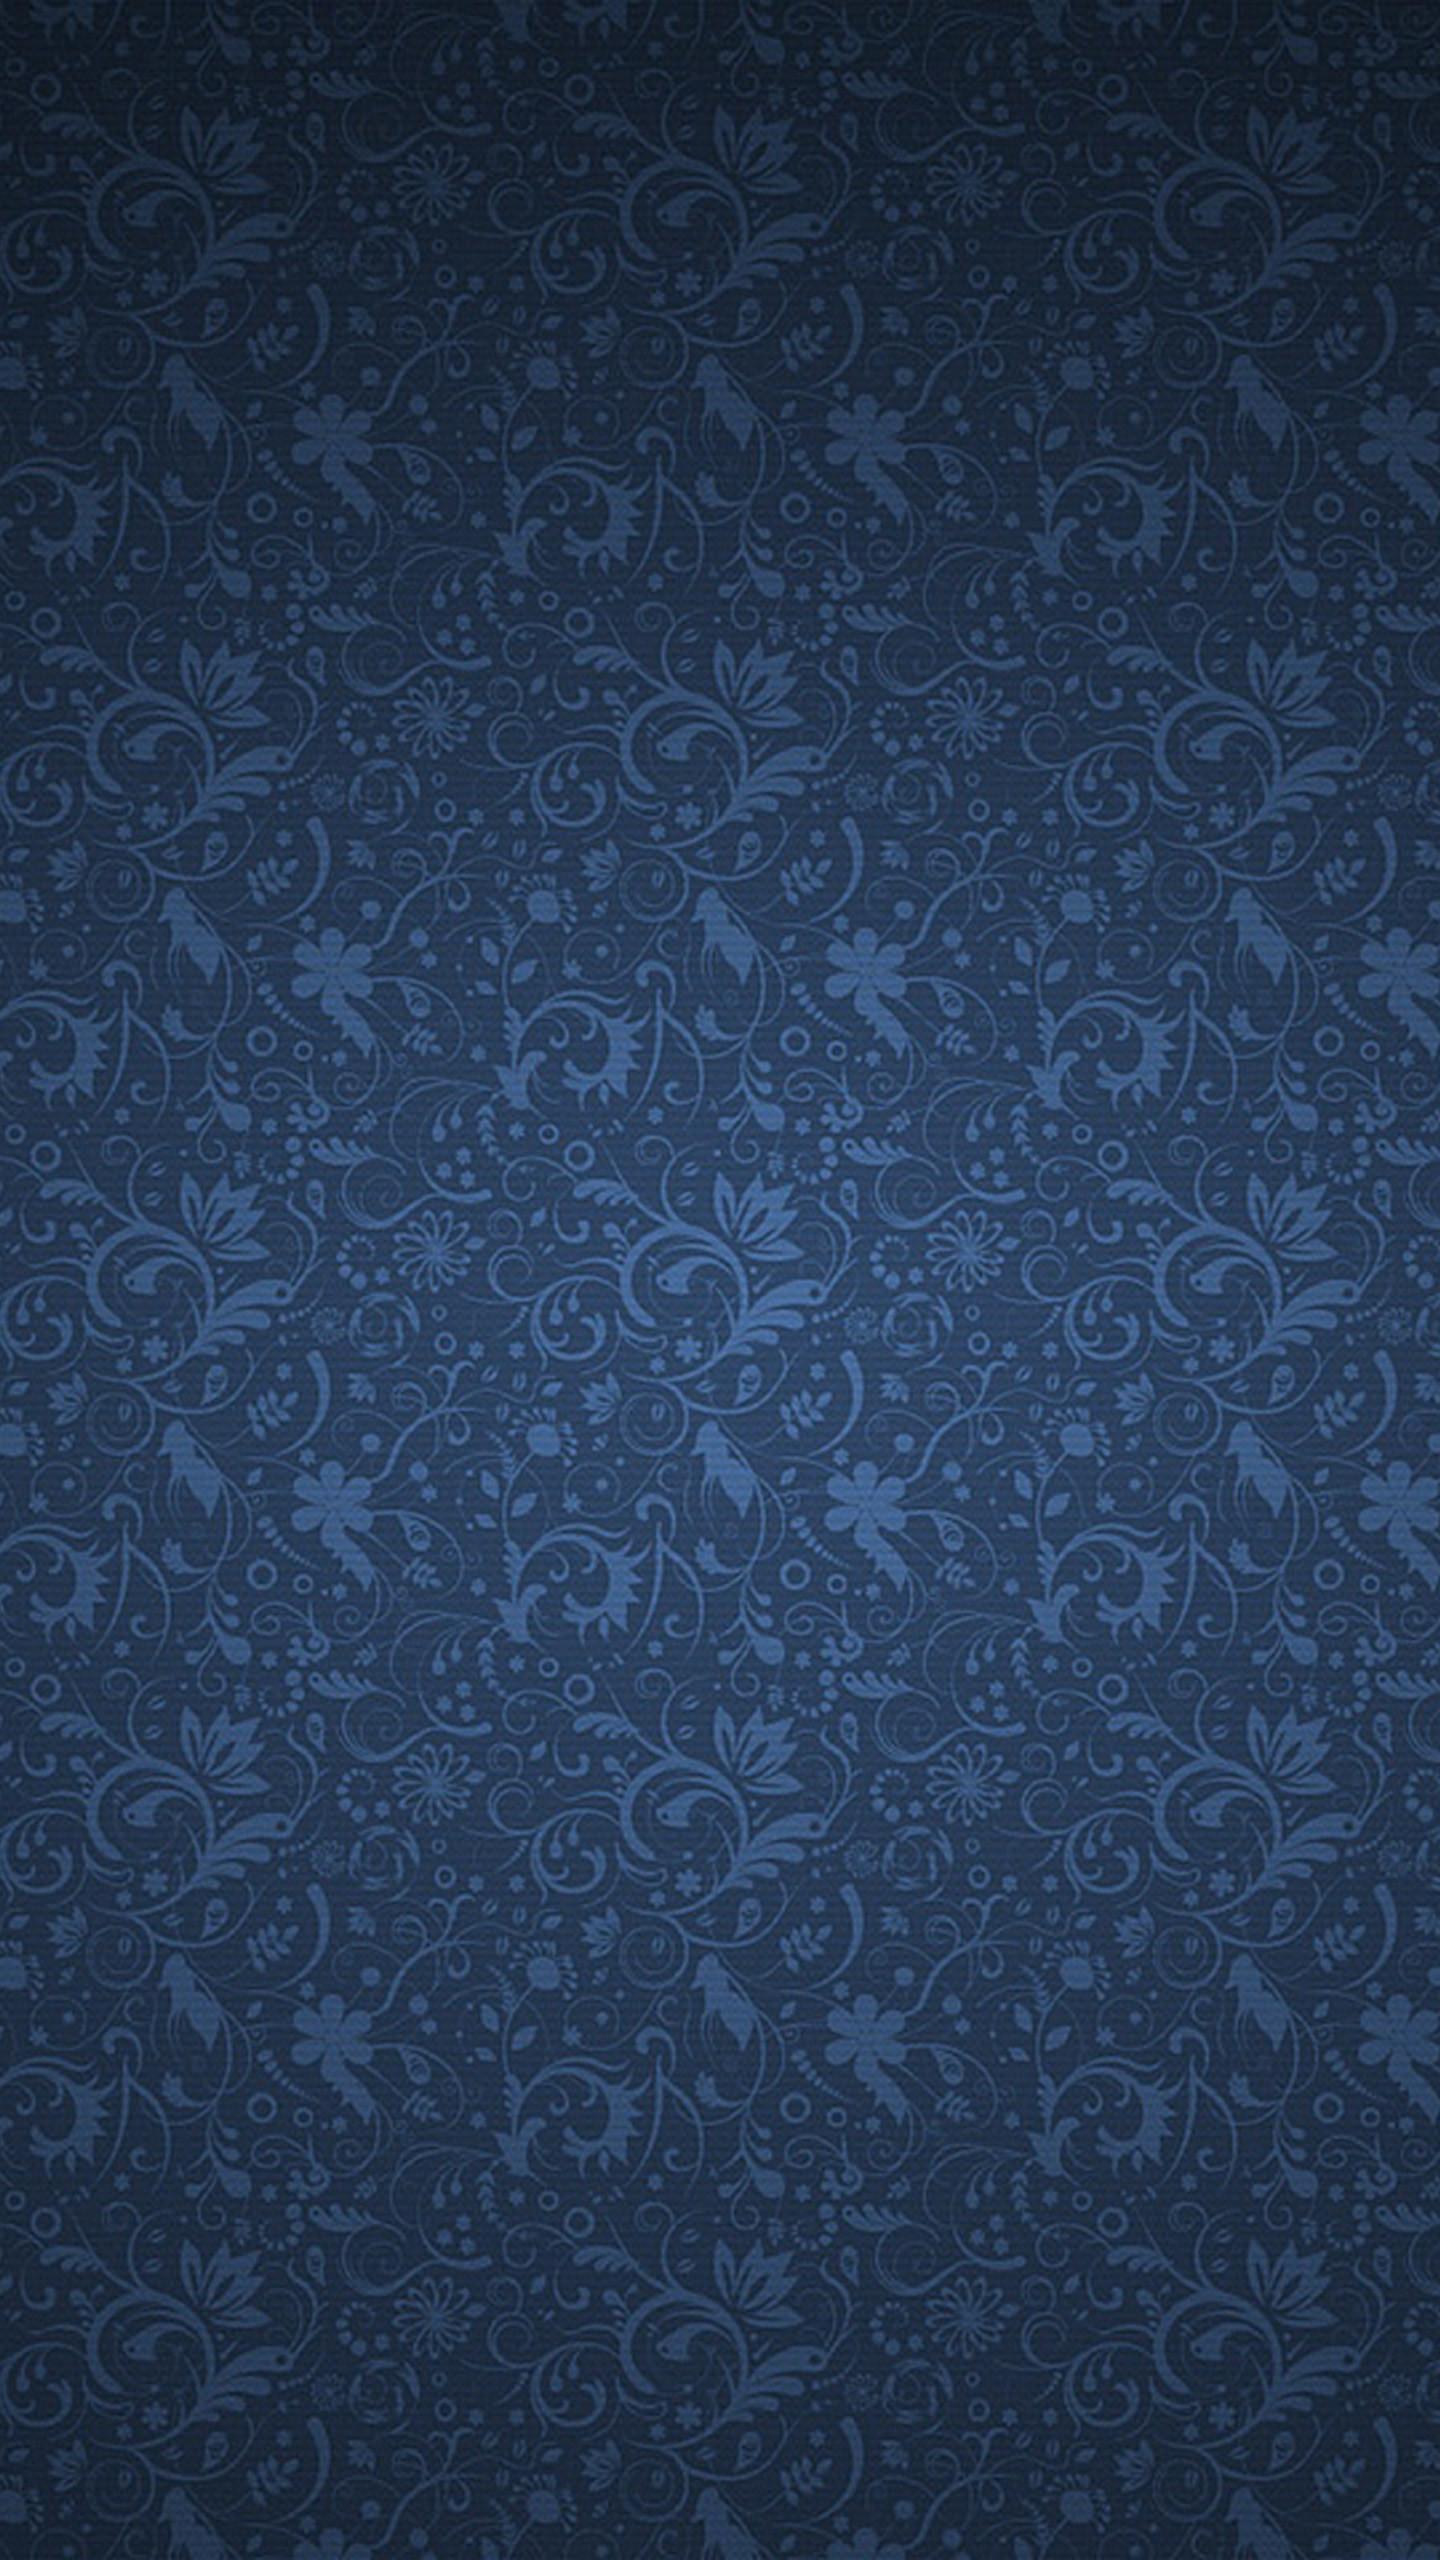 Blue Floral Pattern Wallpaper